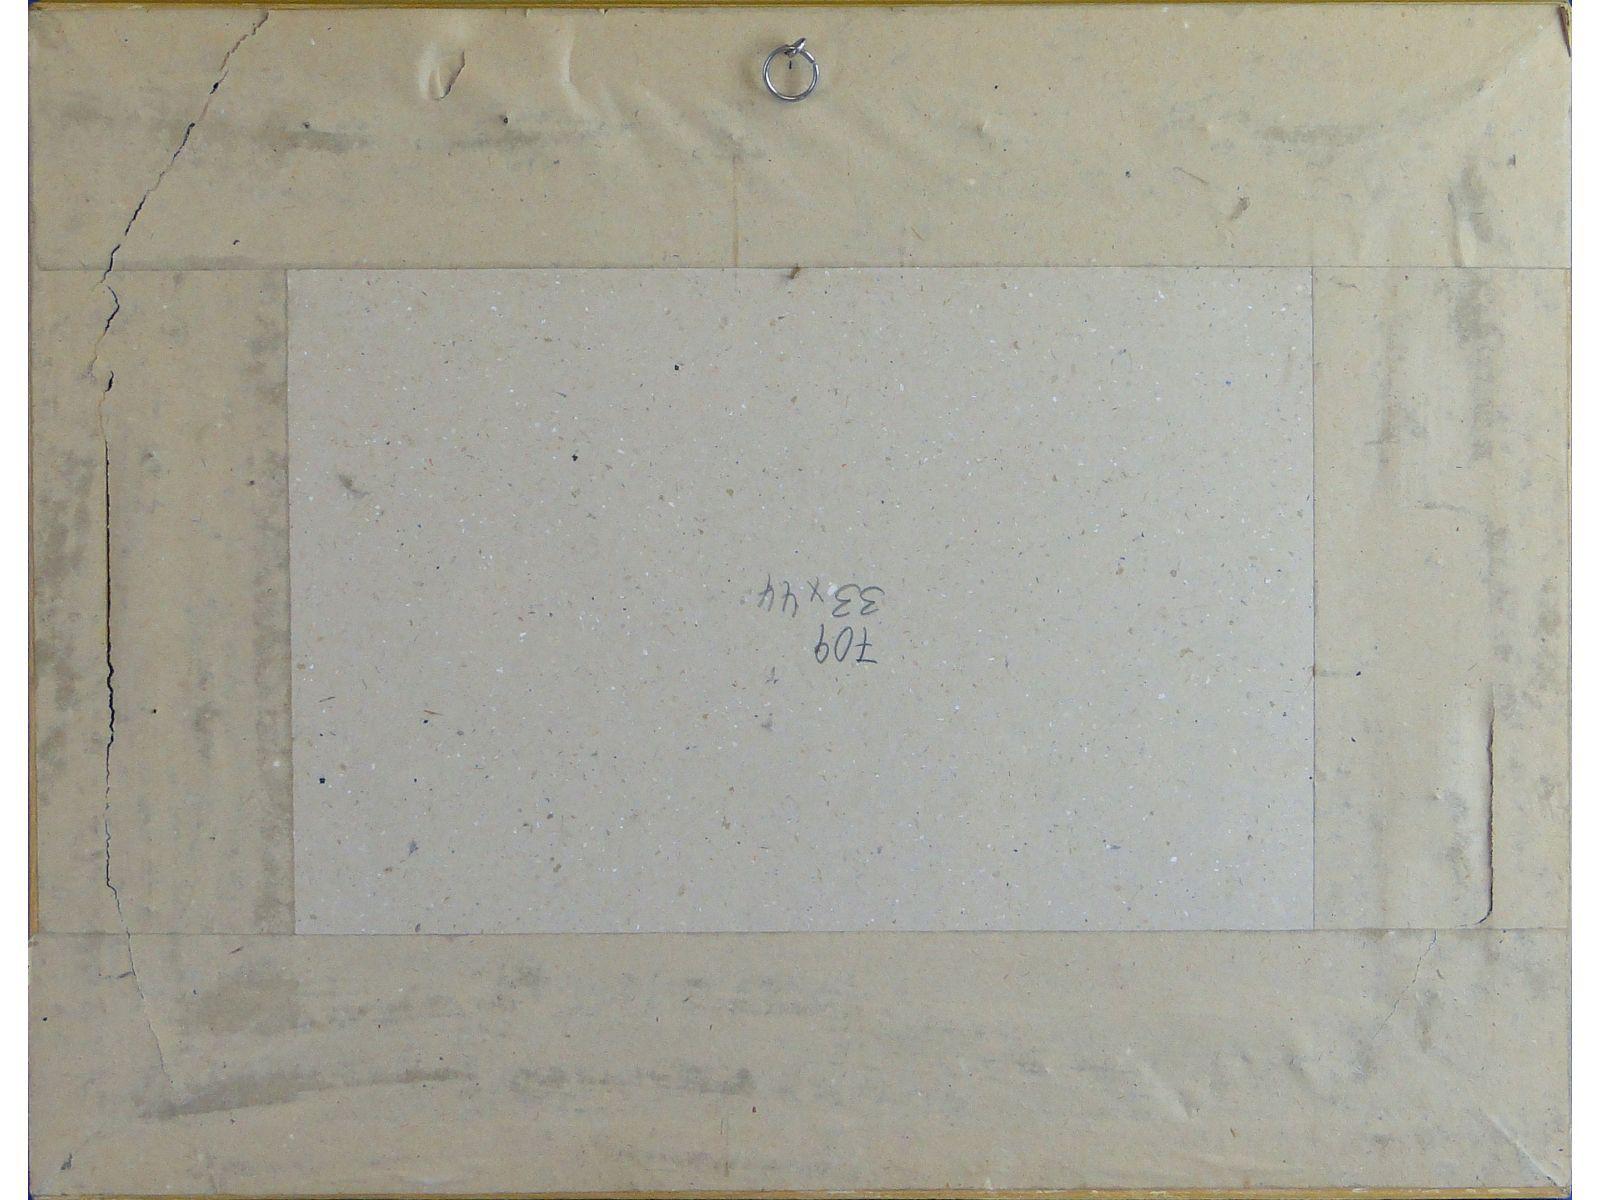 DSC05111.JPG (1600×1200)